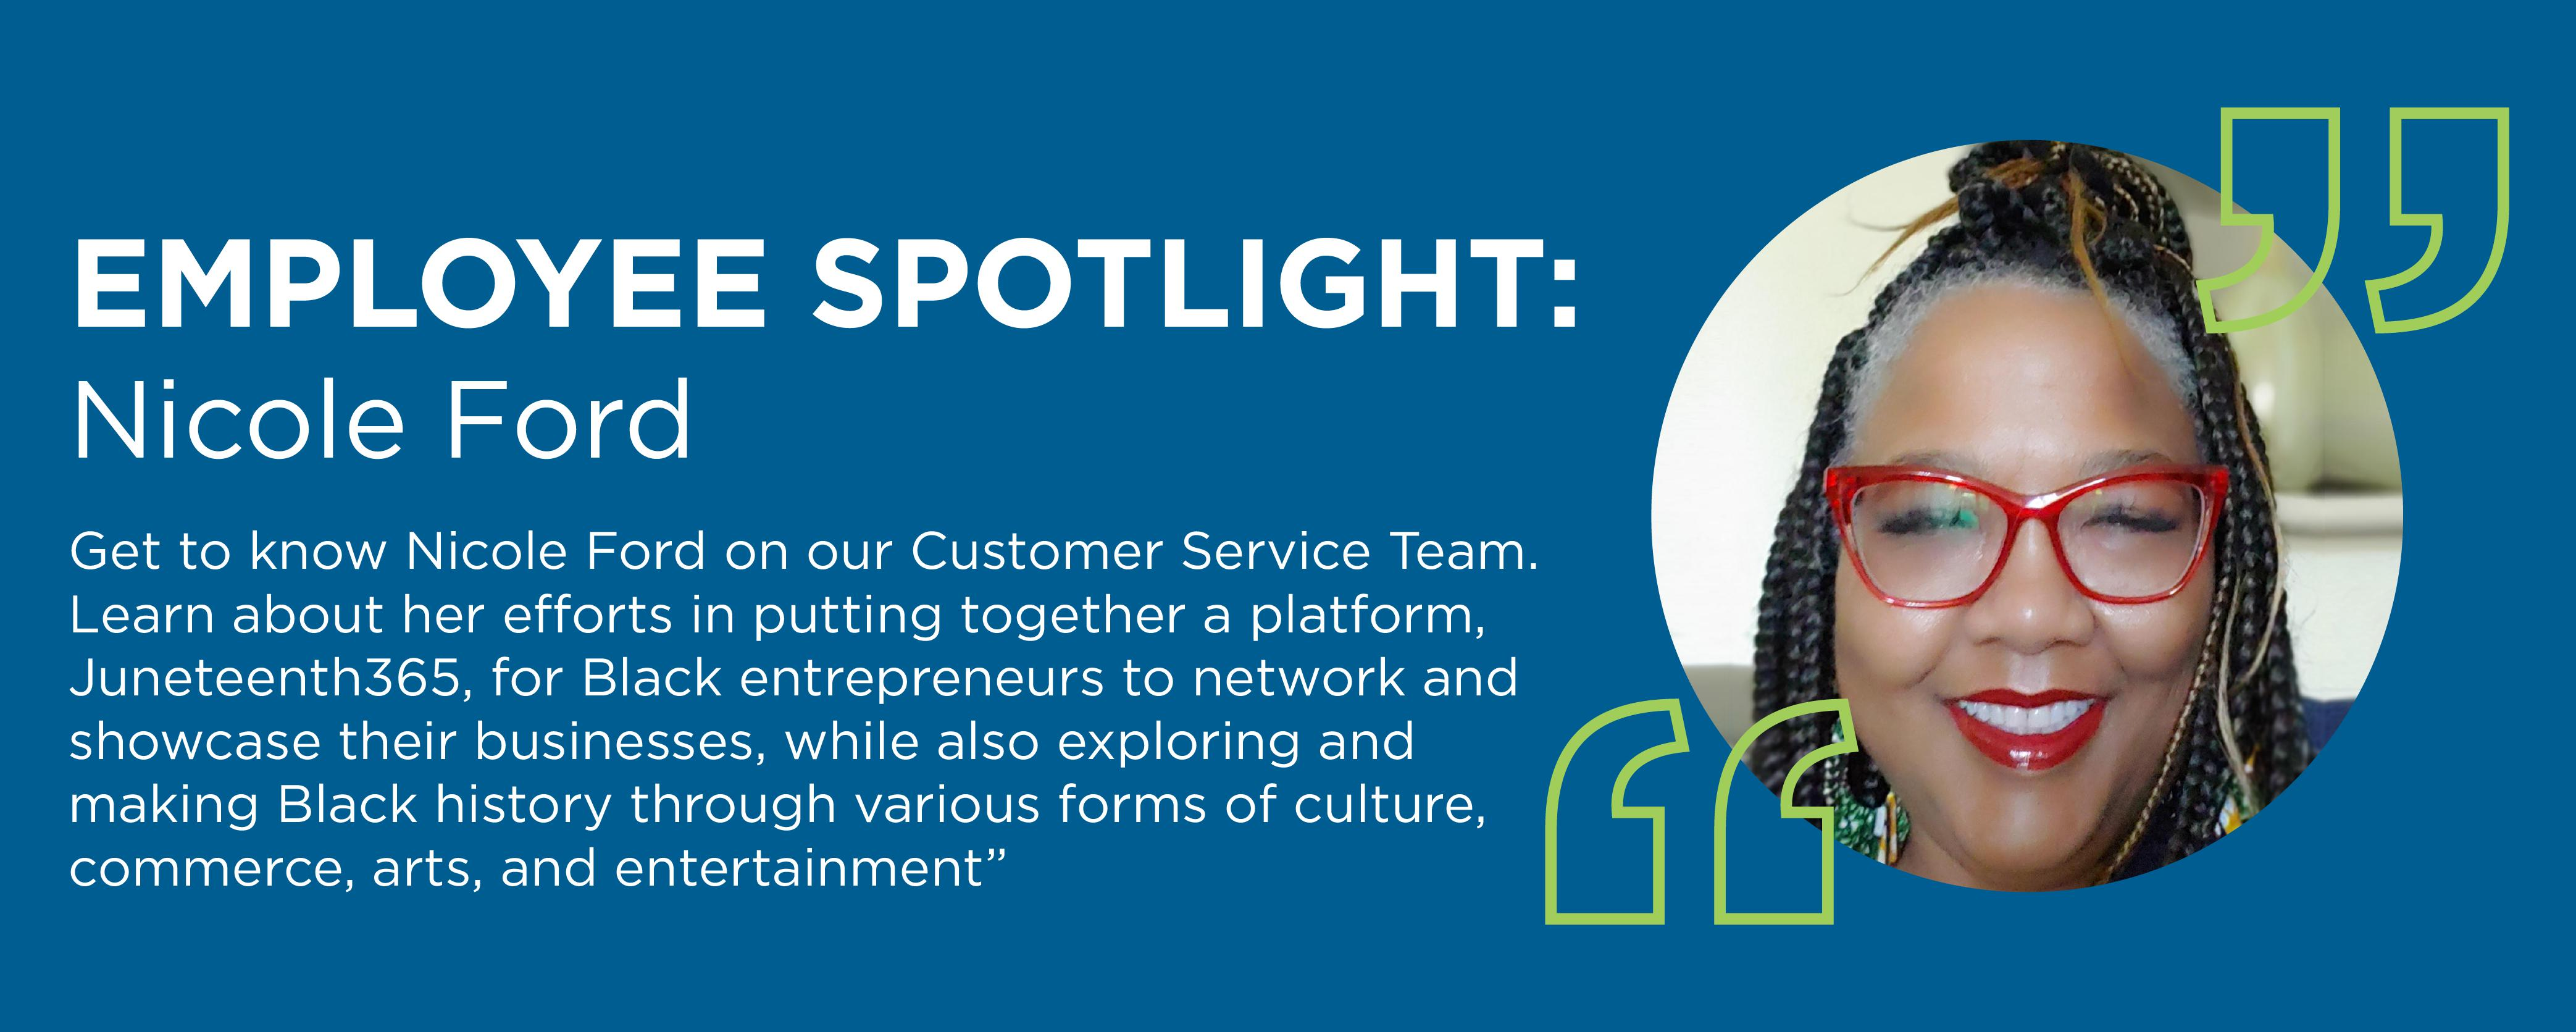 Employee Spotlight: Nicole D. Ford